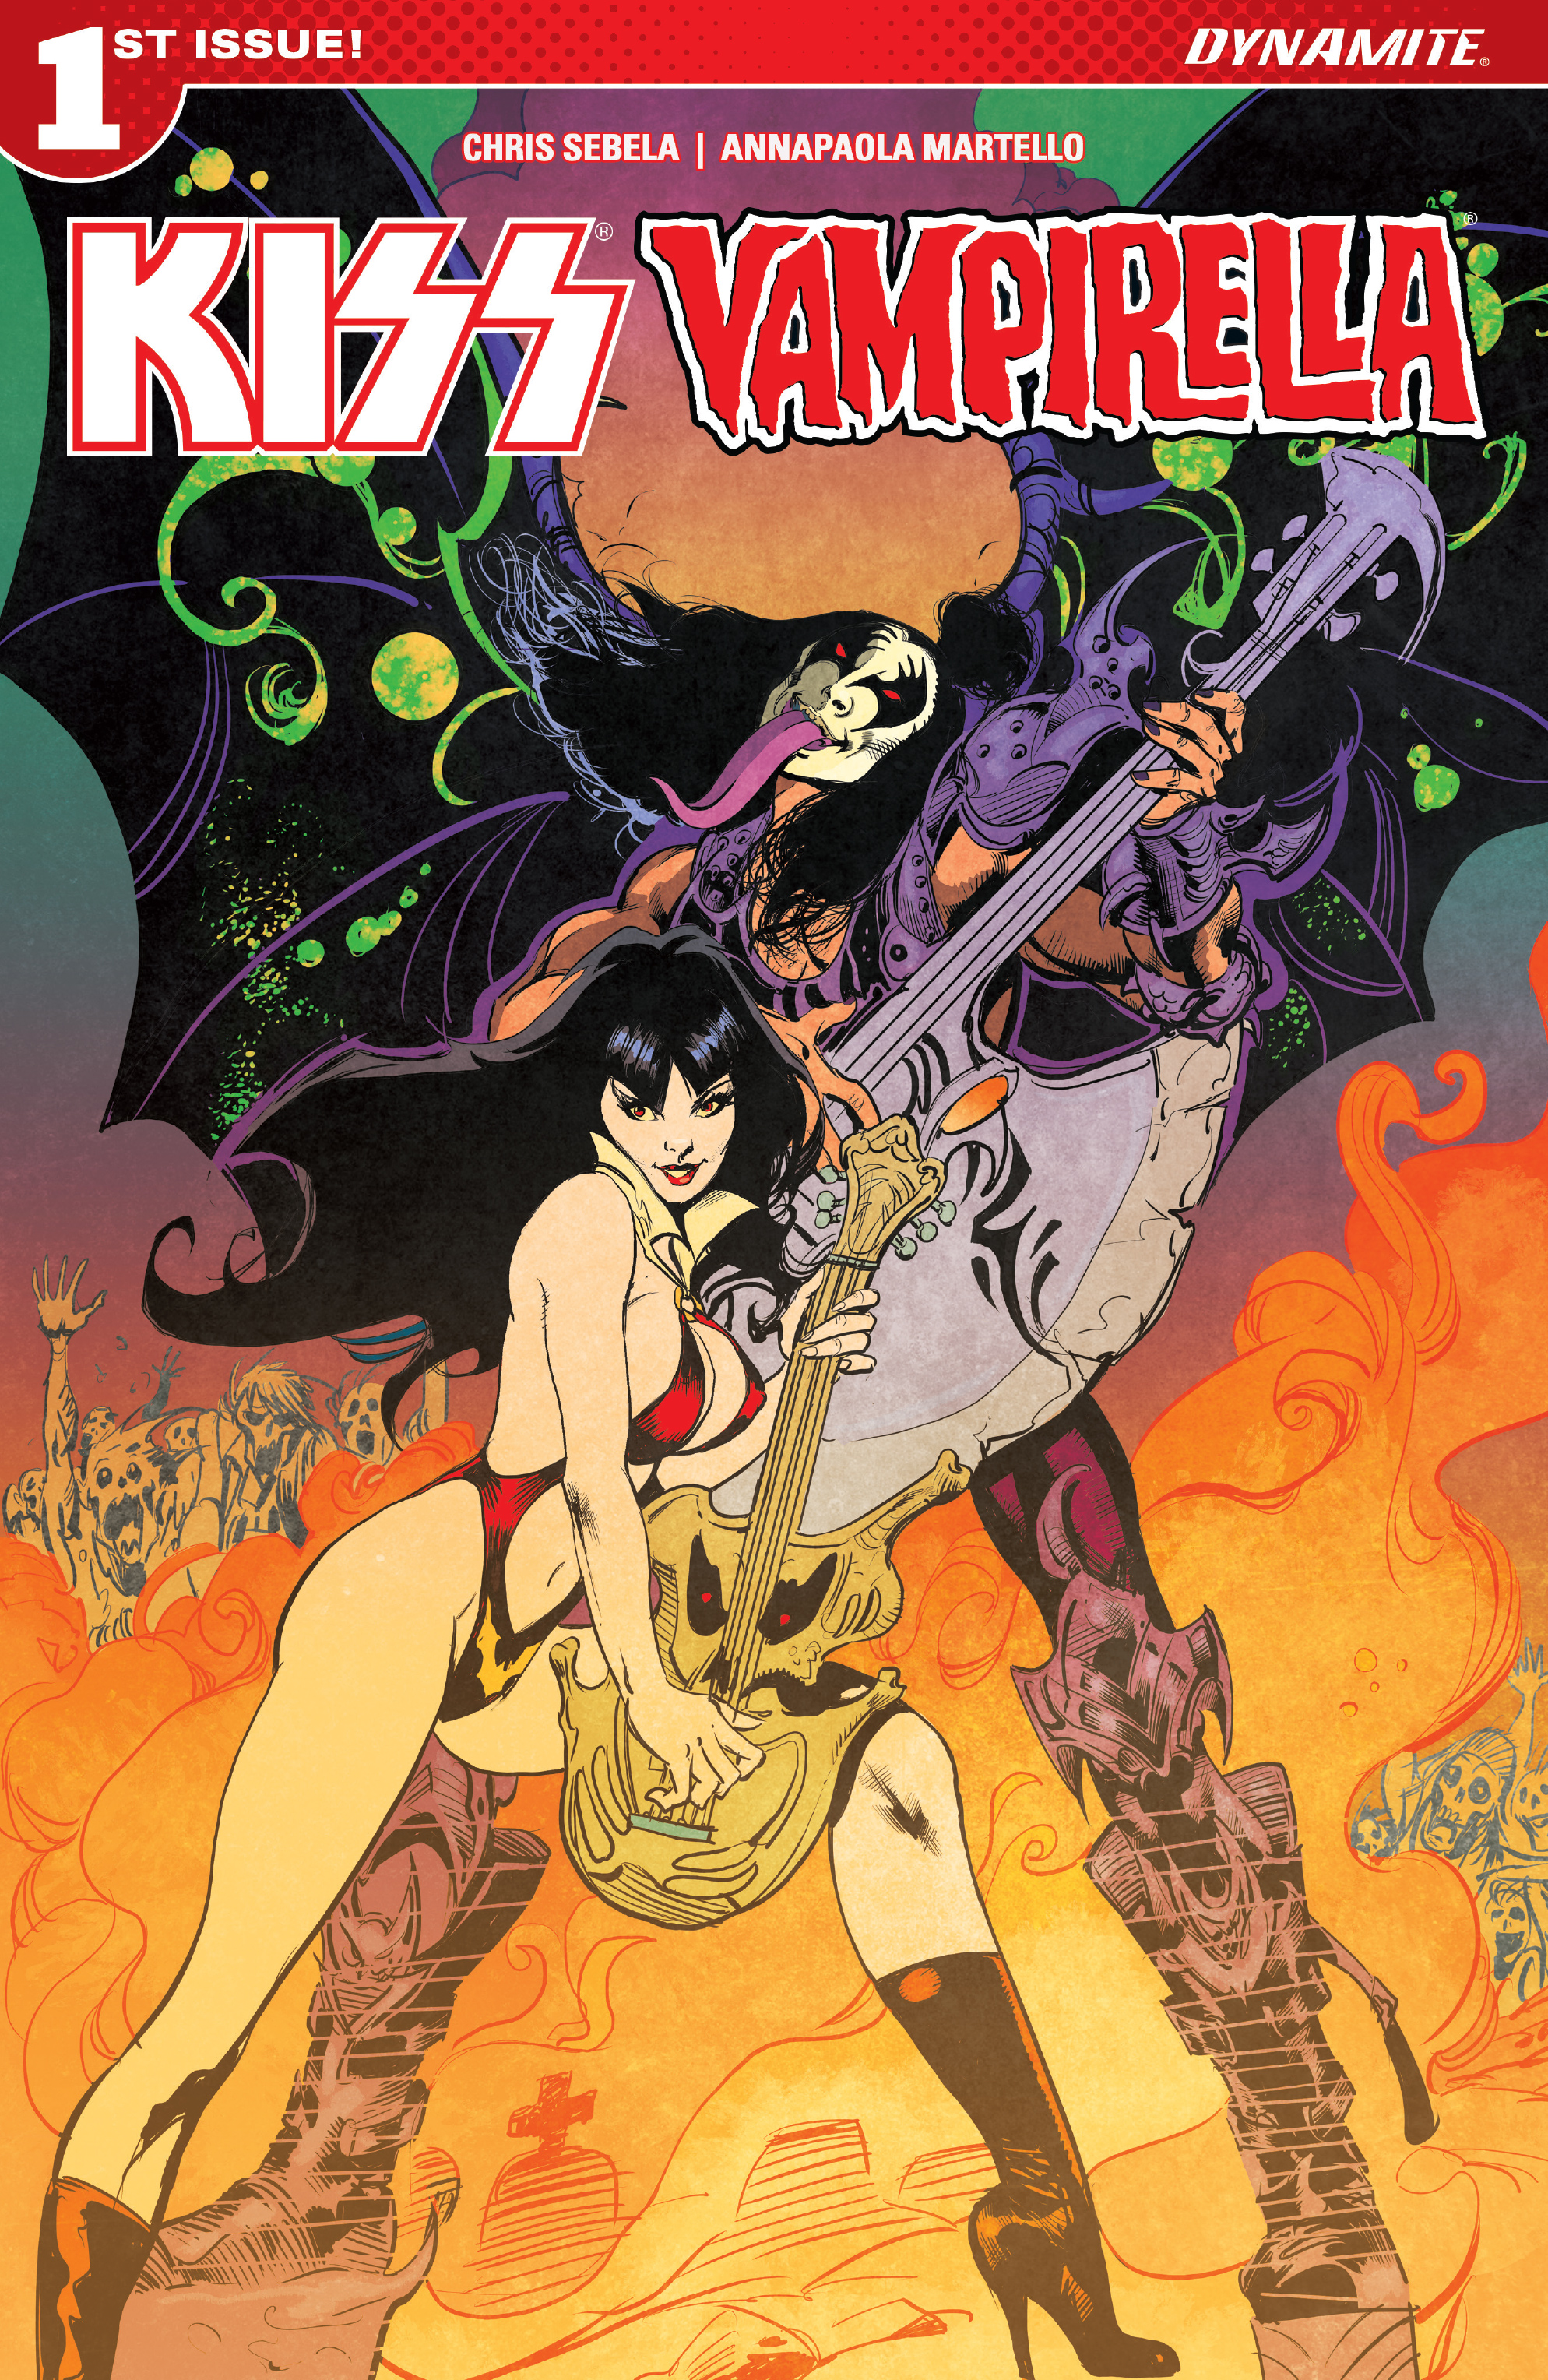 Read online Kiss/Vampirella comic -  Issue #1 - 3